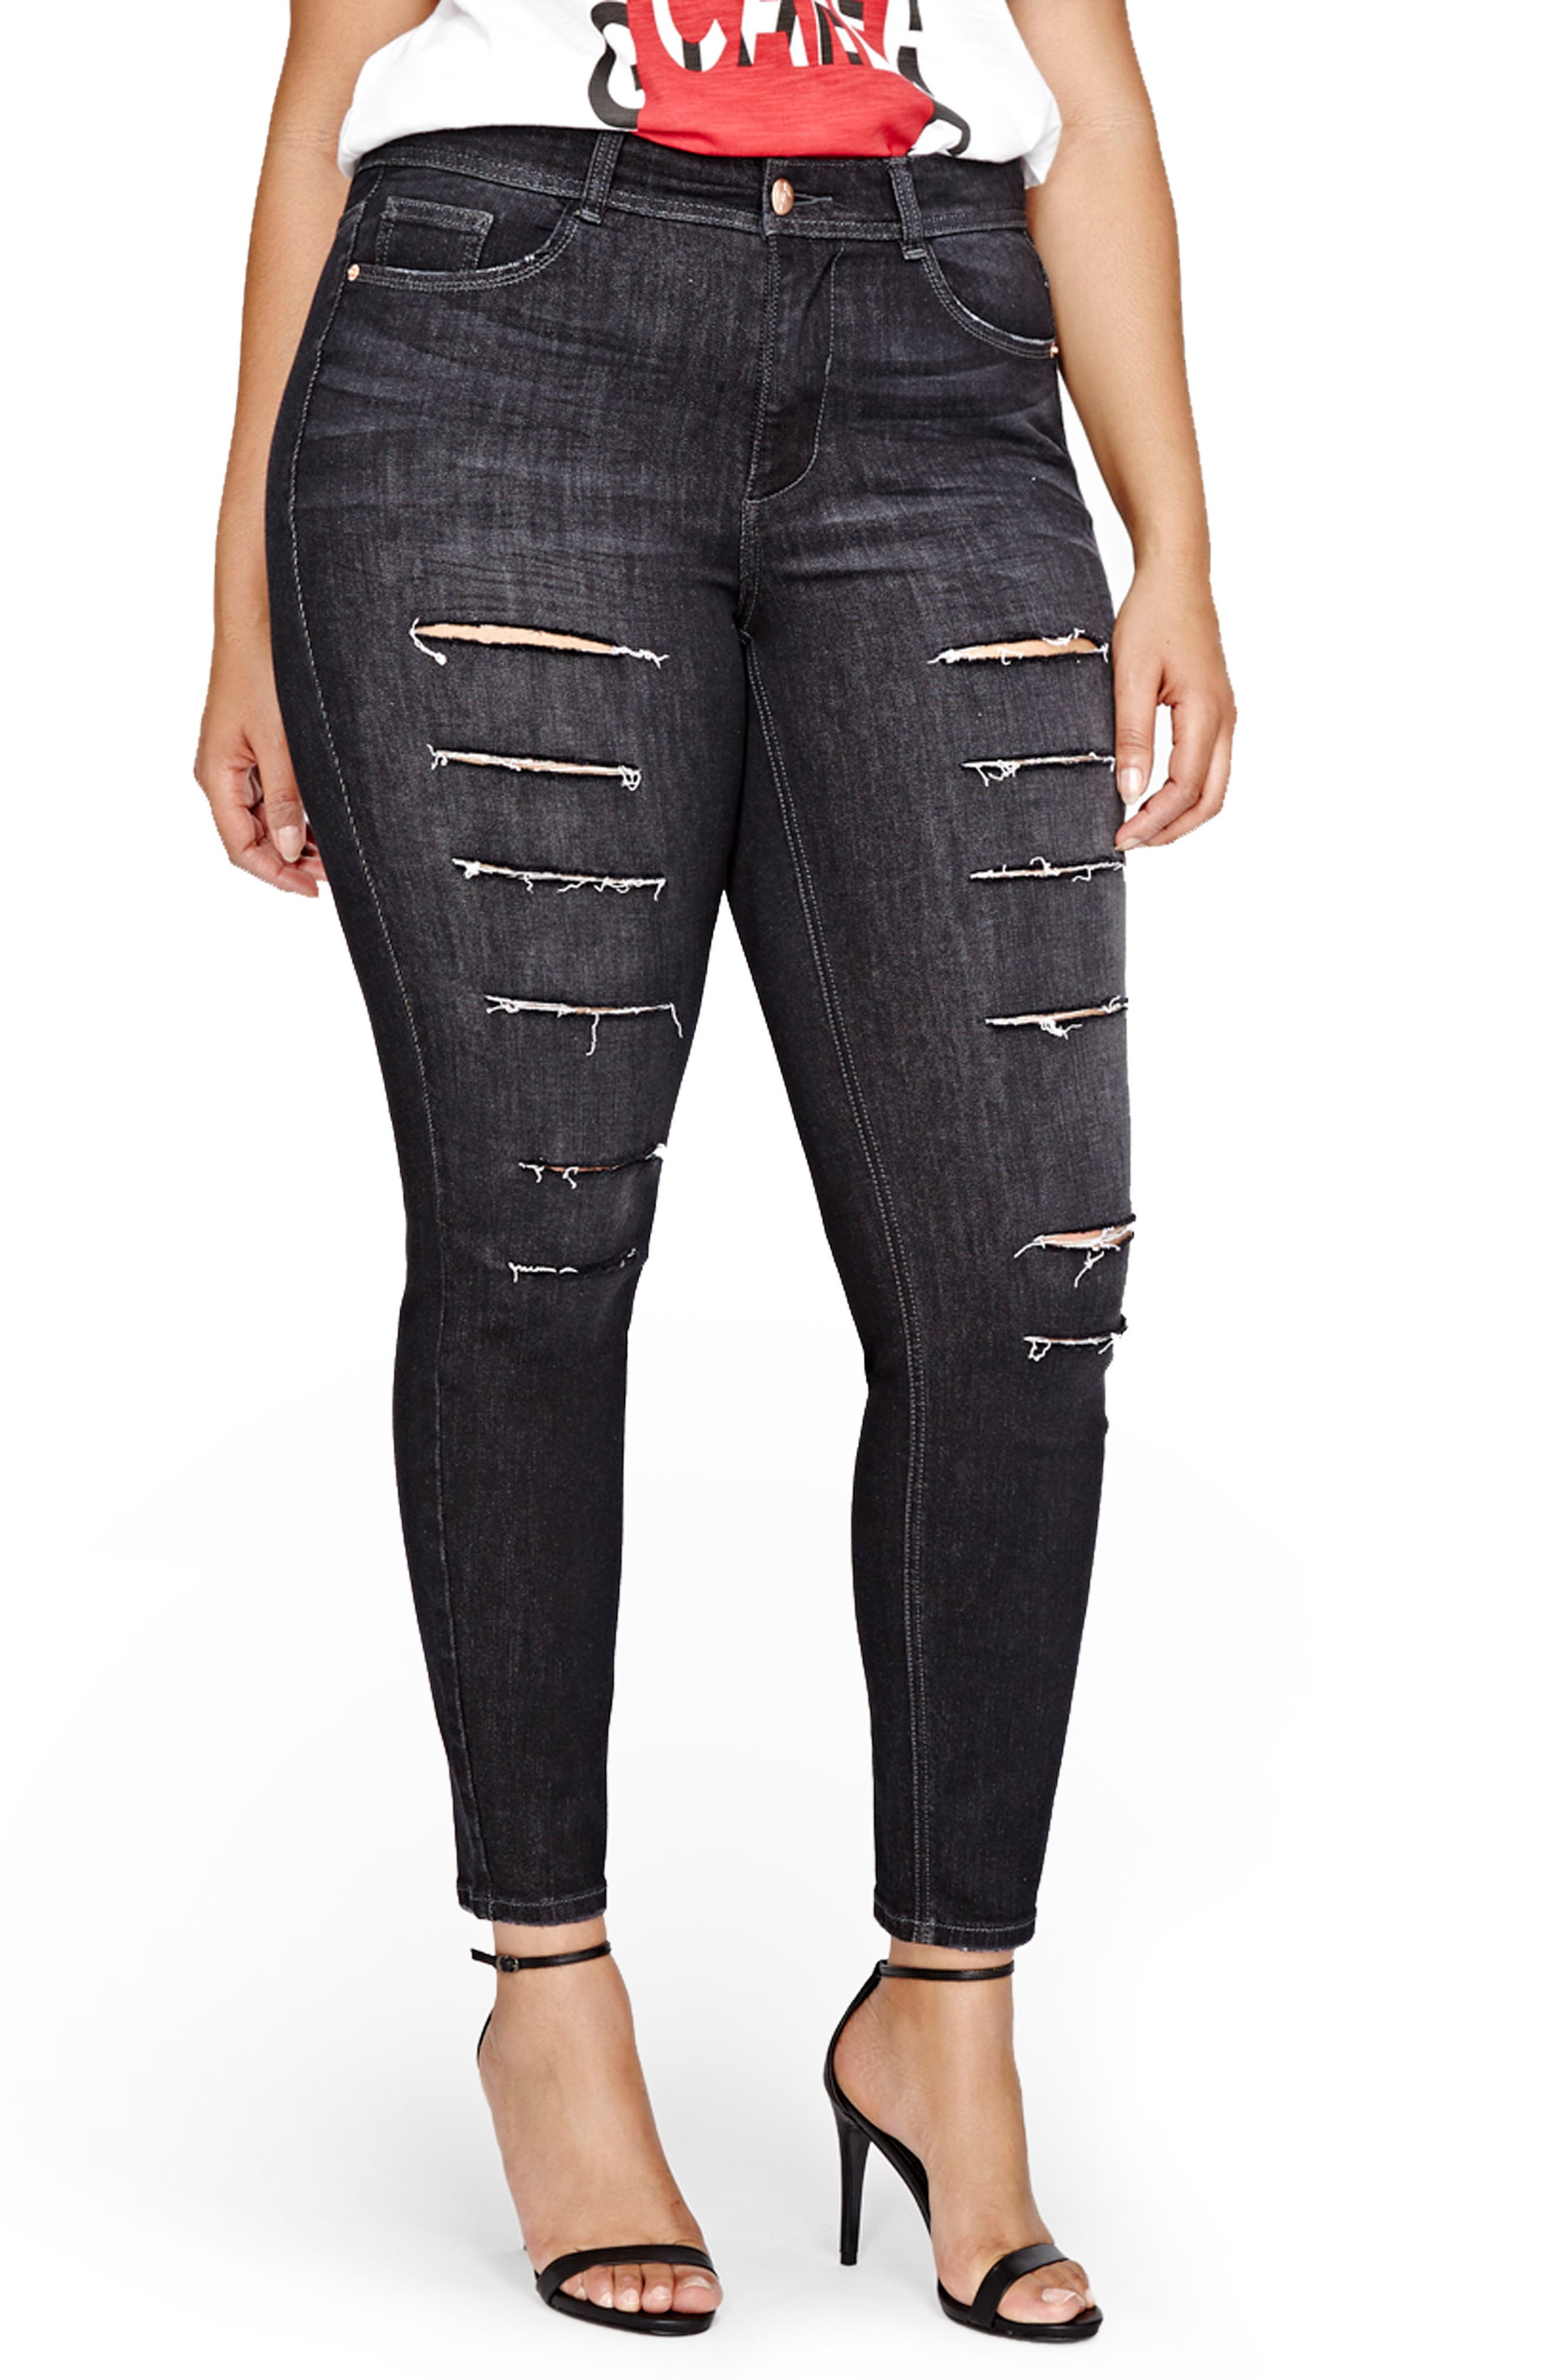 Main Image - ADDITION ELLE LOVE AND LEGEND Slash Skinny Jeans (Plus Size)